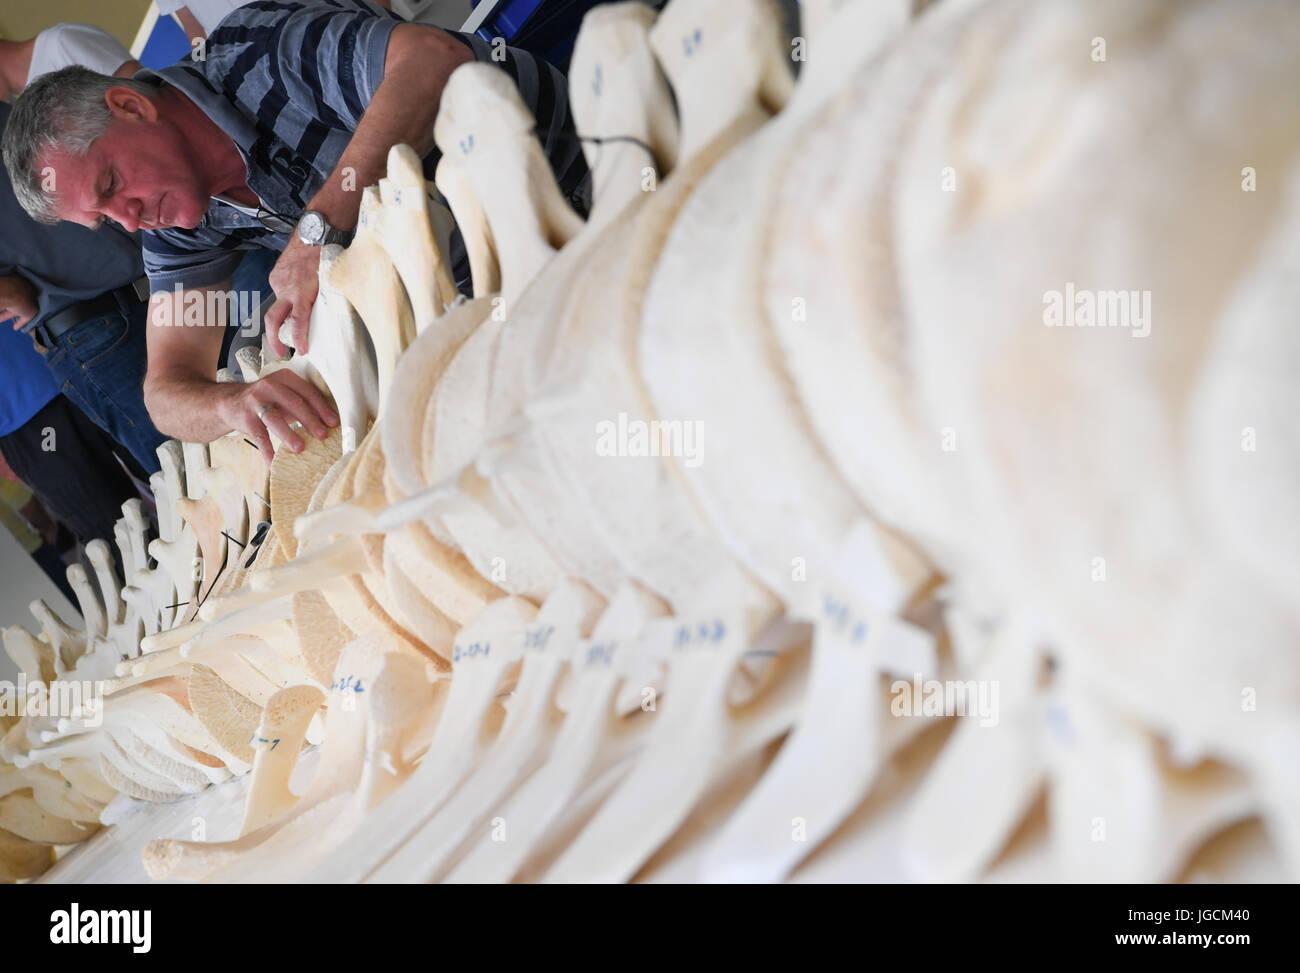 Großzügig Wal Skelett Anatomie Fotos - Anatomie Ideen - finotti.info